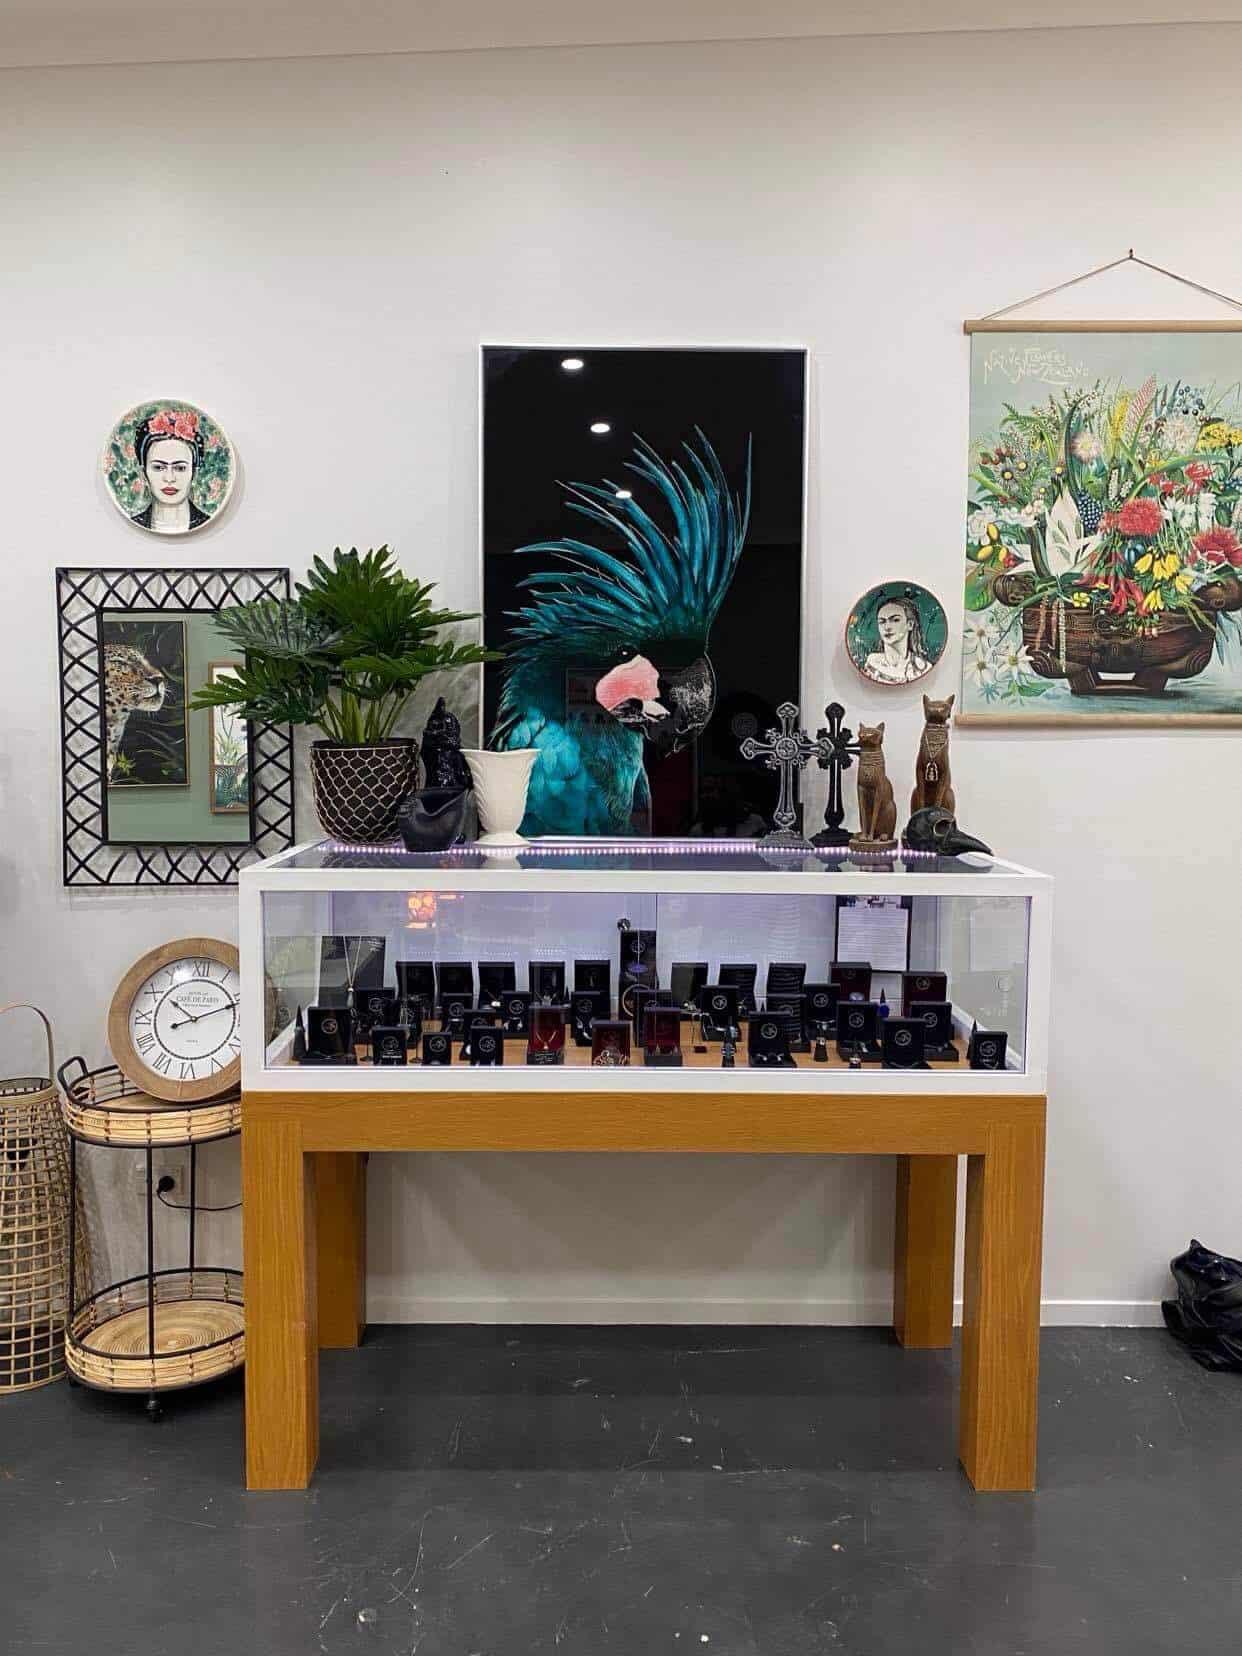 Moss Shop Coromandel Gifts